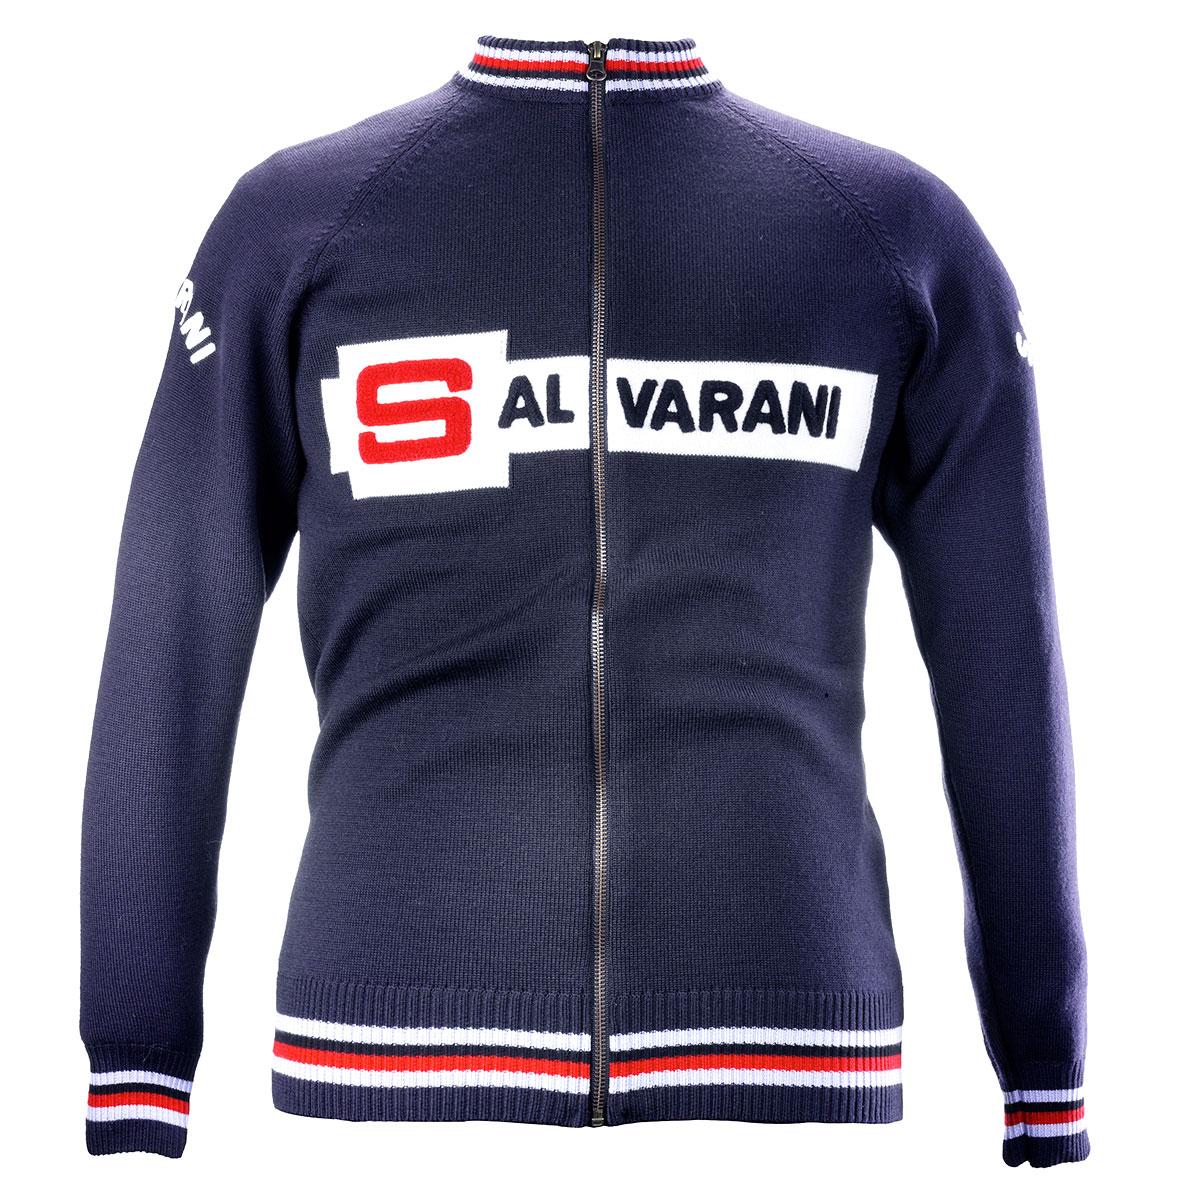 Magliamo/'s Salvarani Team Merino Wool Track Top